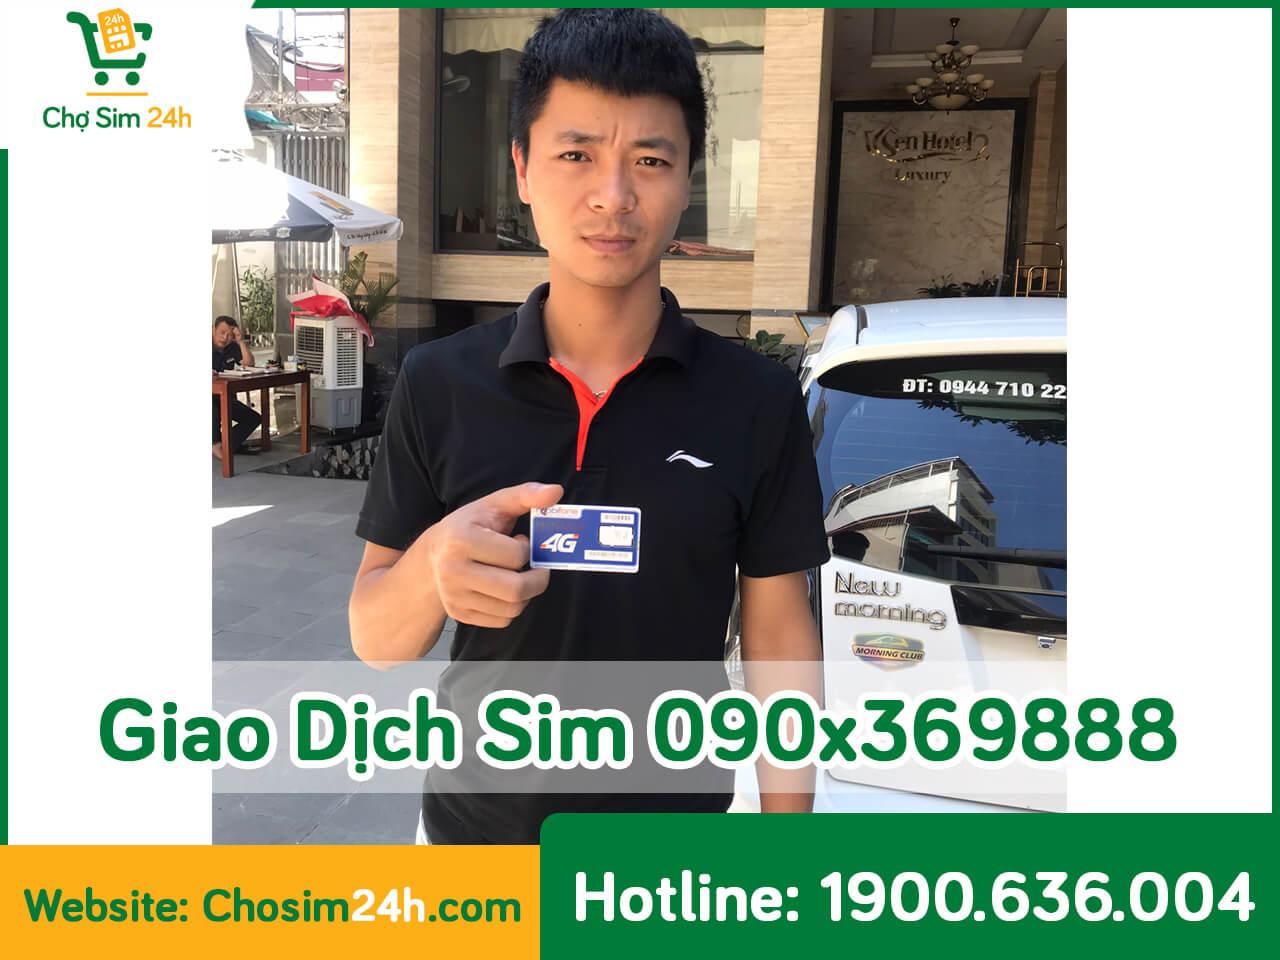 giao-dich-sim-090x369888_3